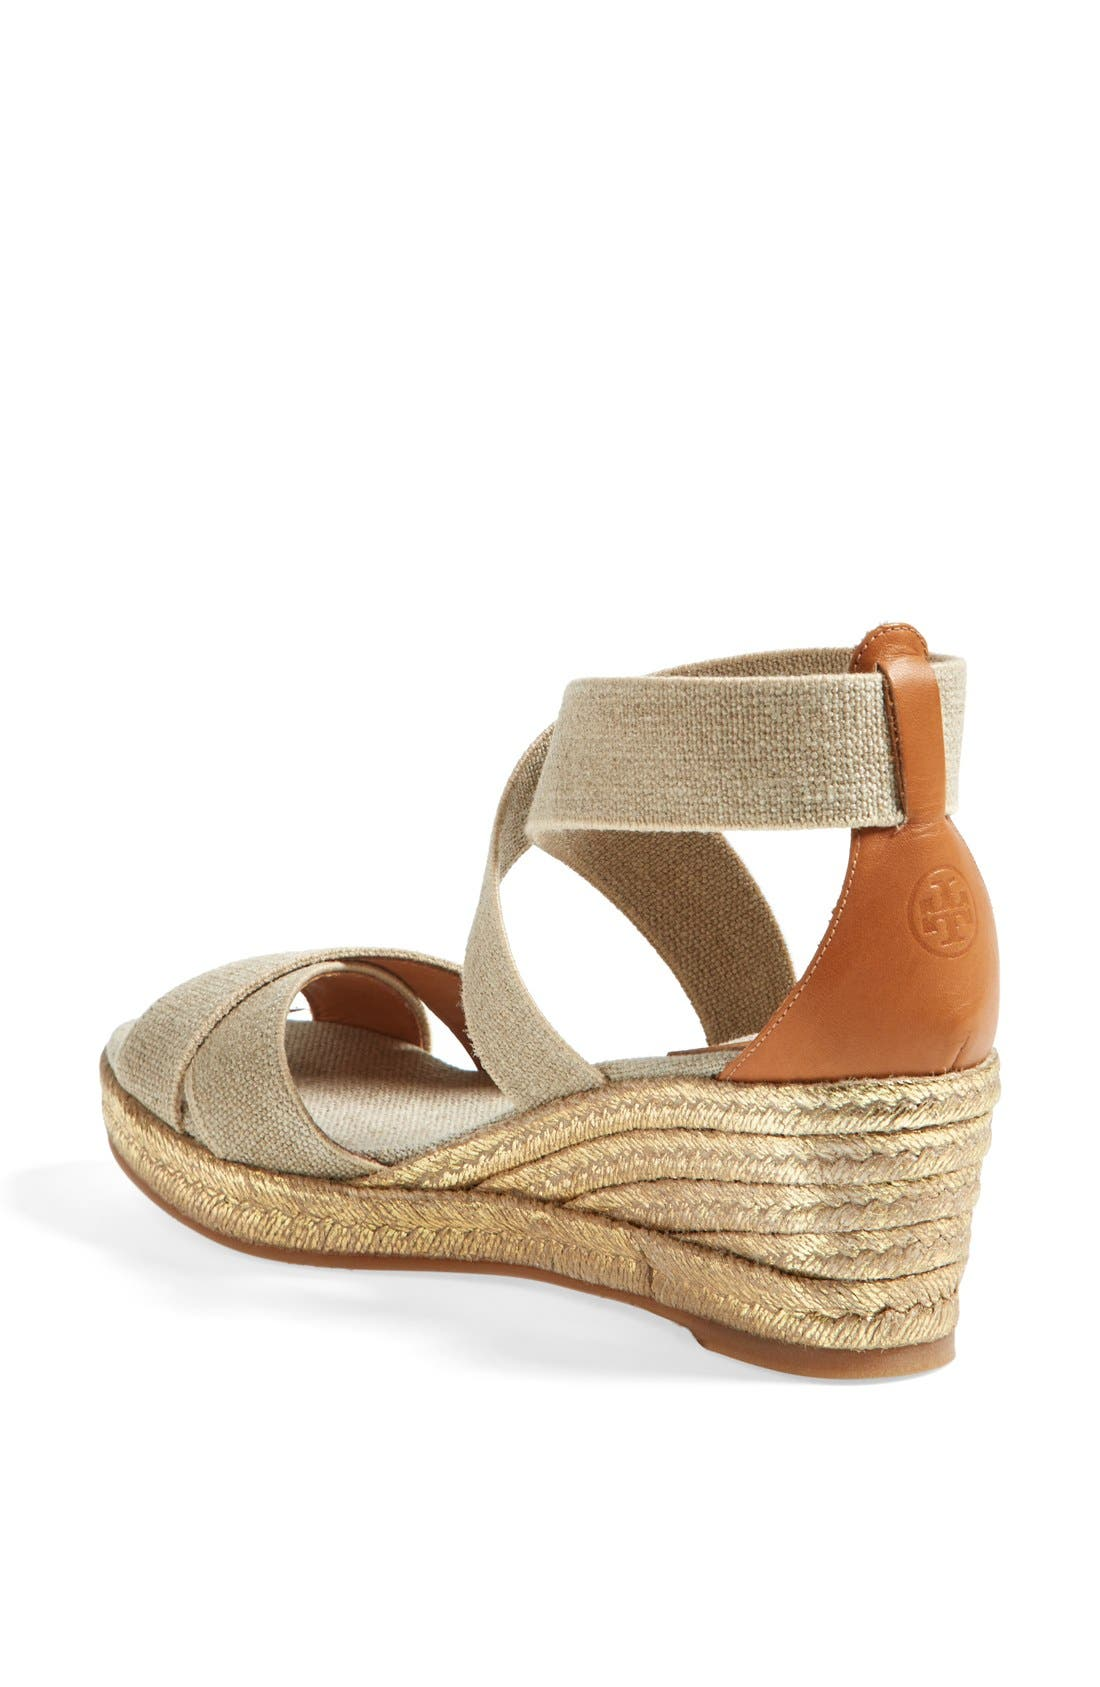 Alternate Image 2  - Tory Burch 'Adonis' Sandal (Online Only)